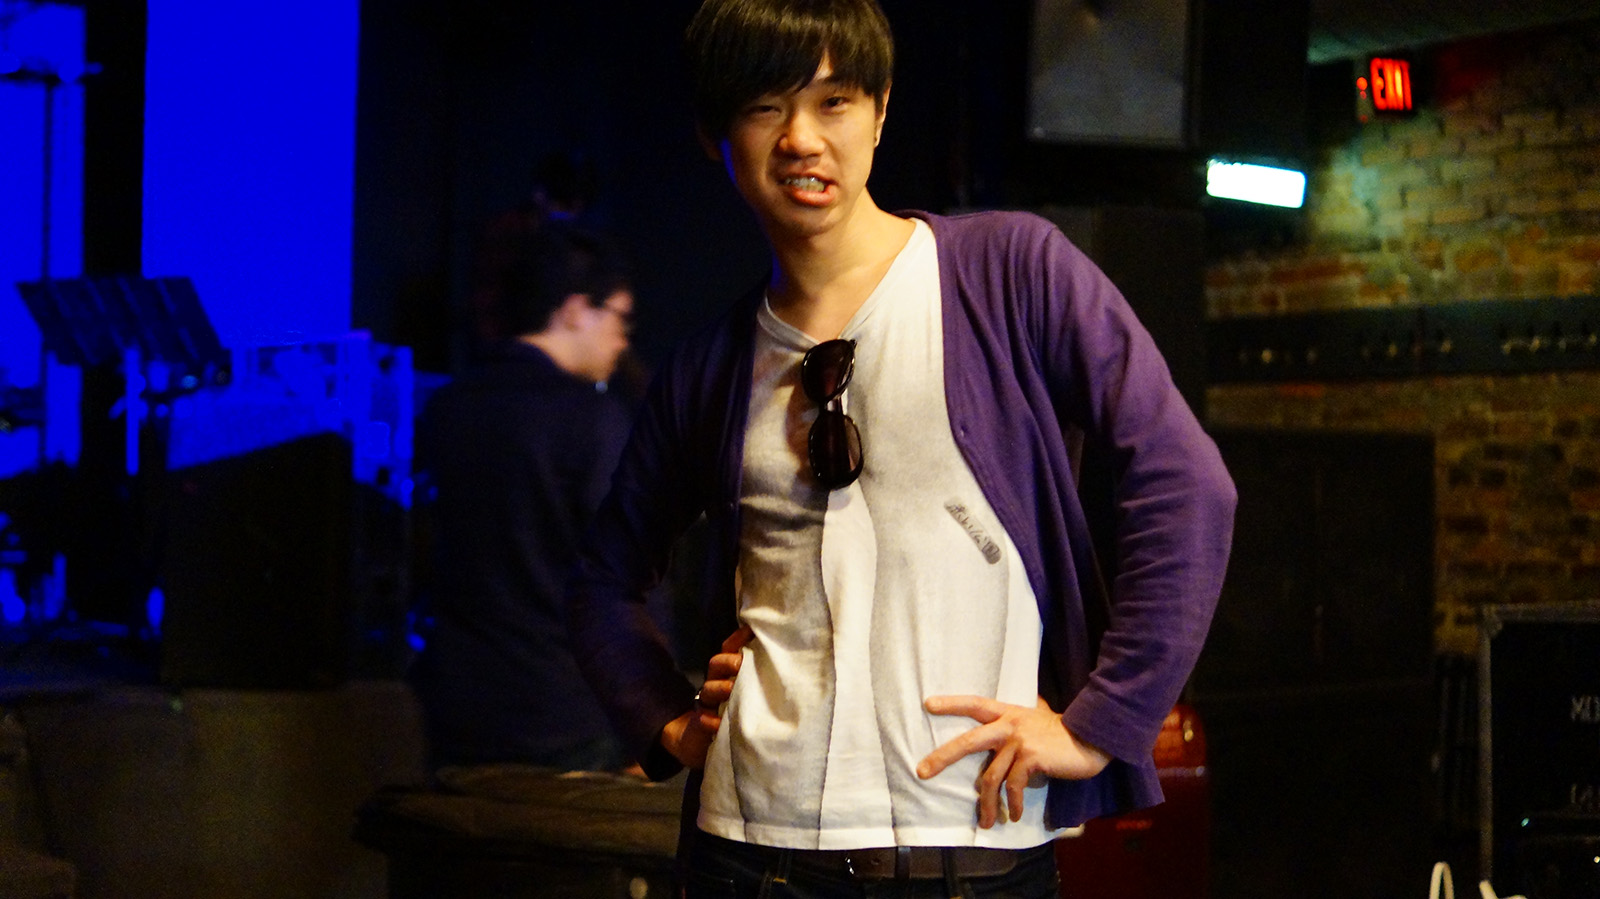 leader pose